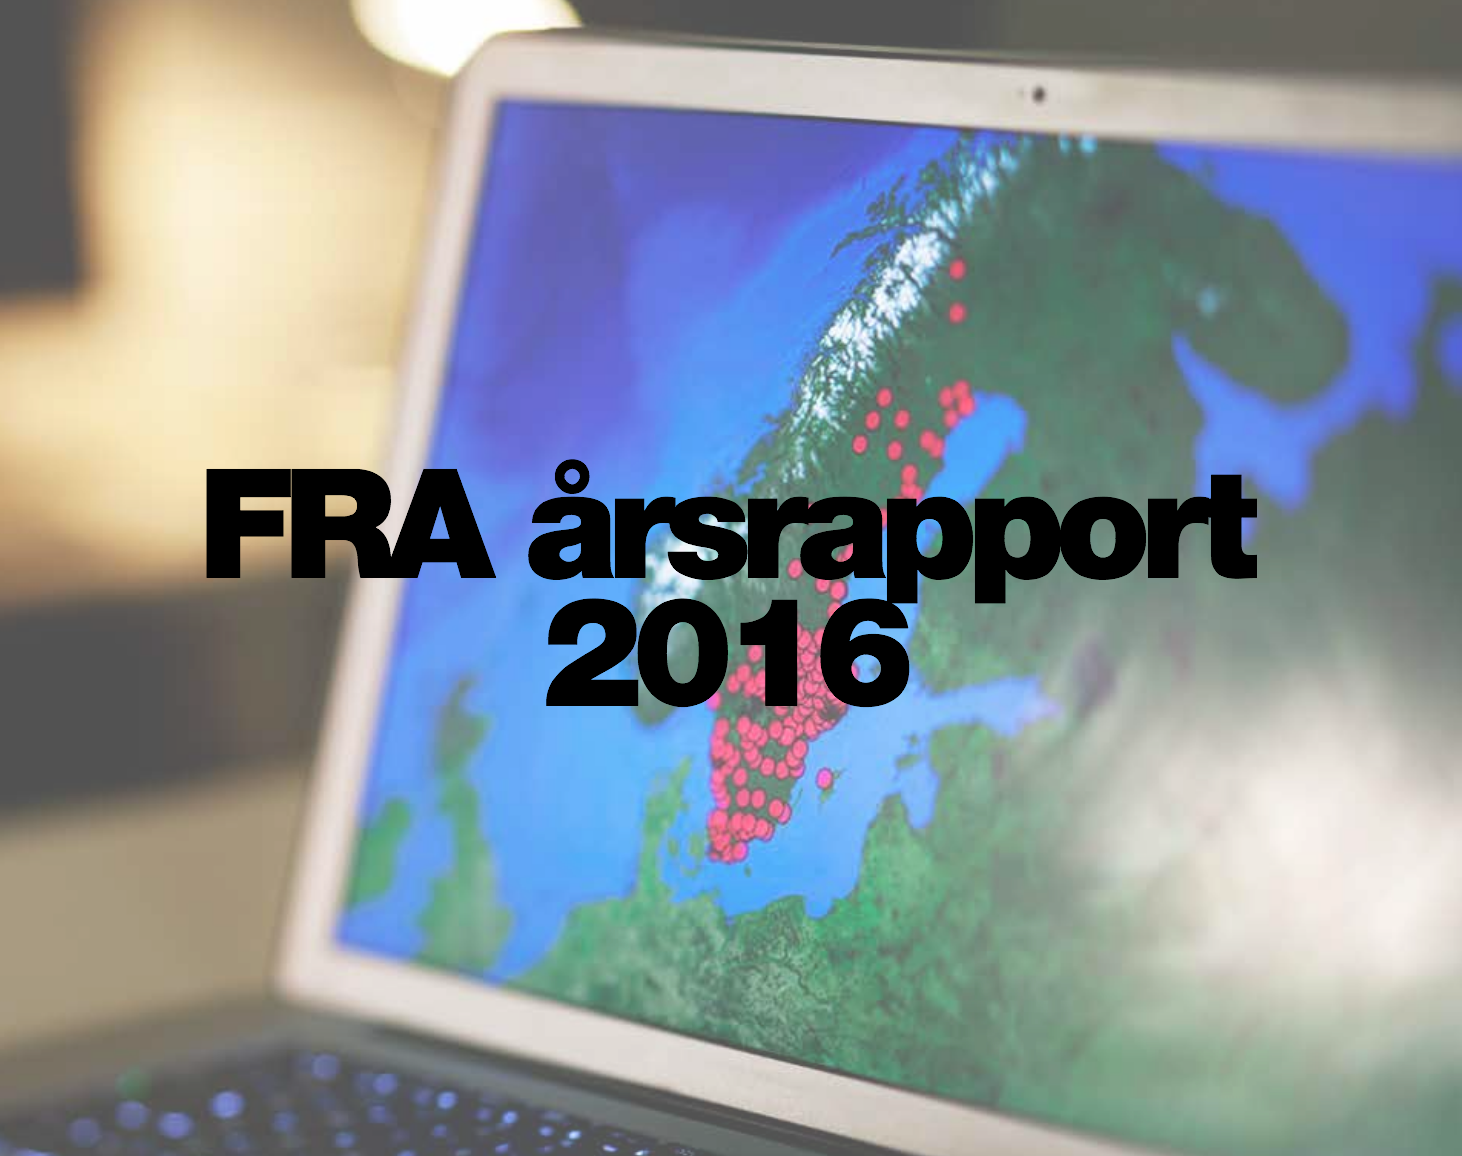 FRA årsrapport 2016